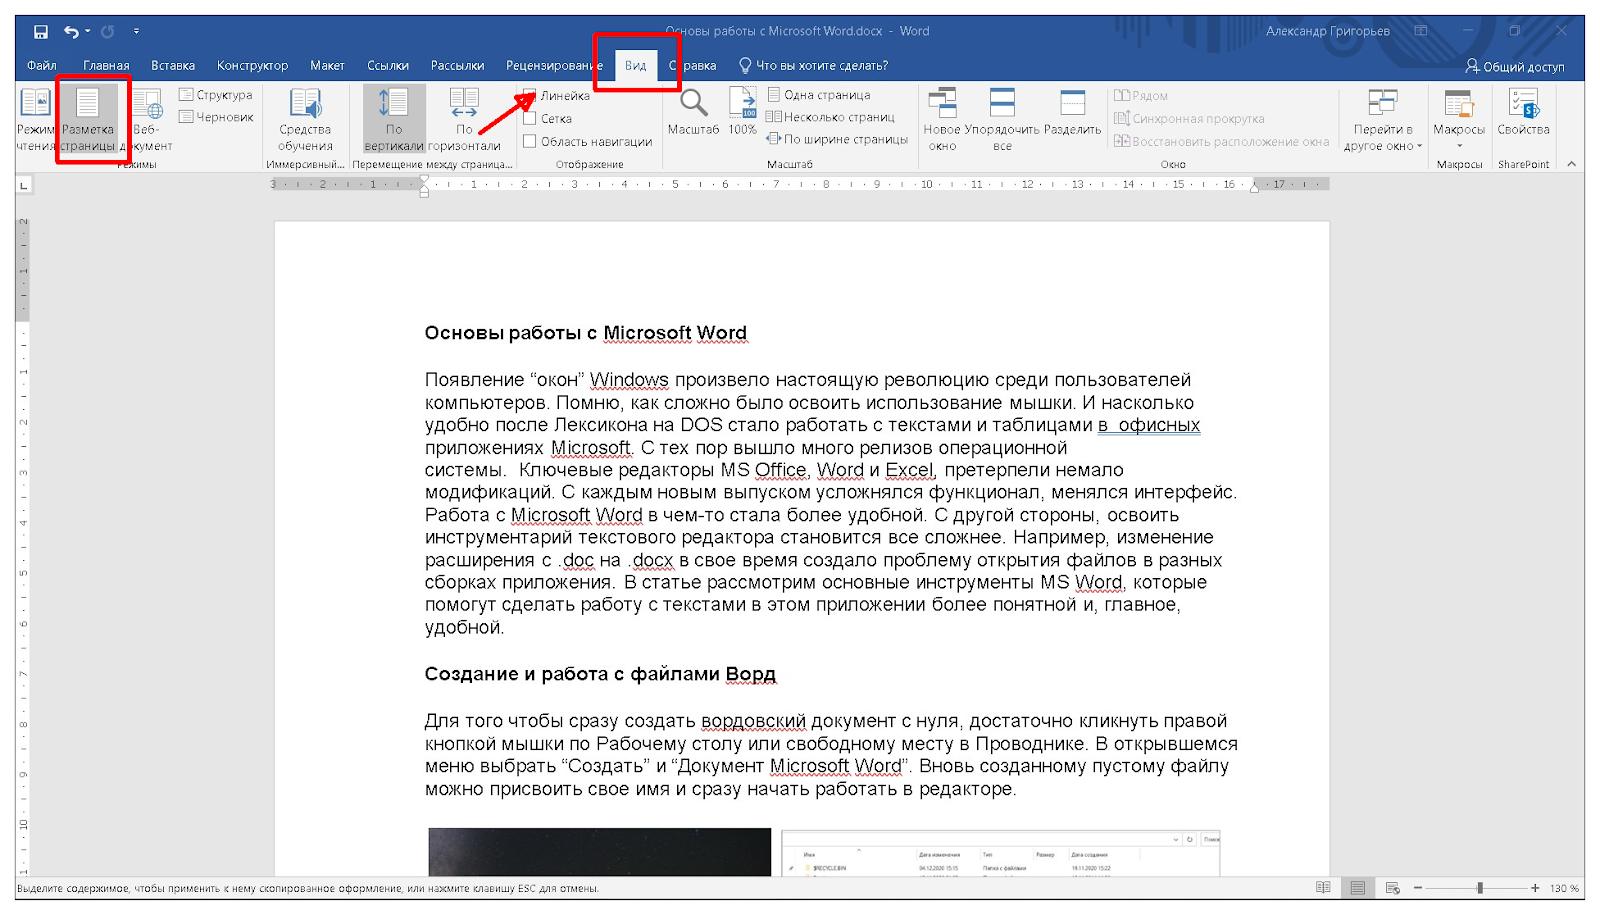 MS Word настраиваем параметры страницы